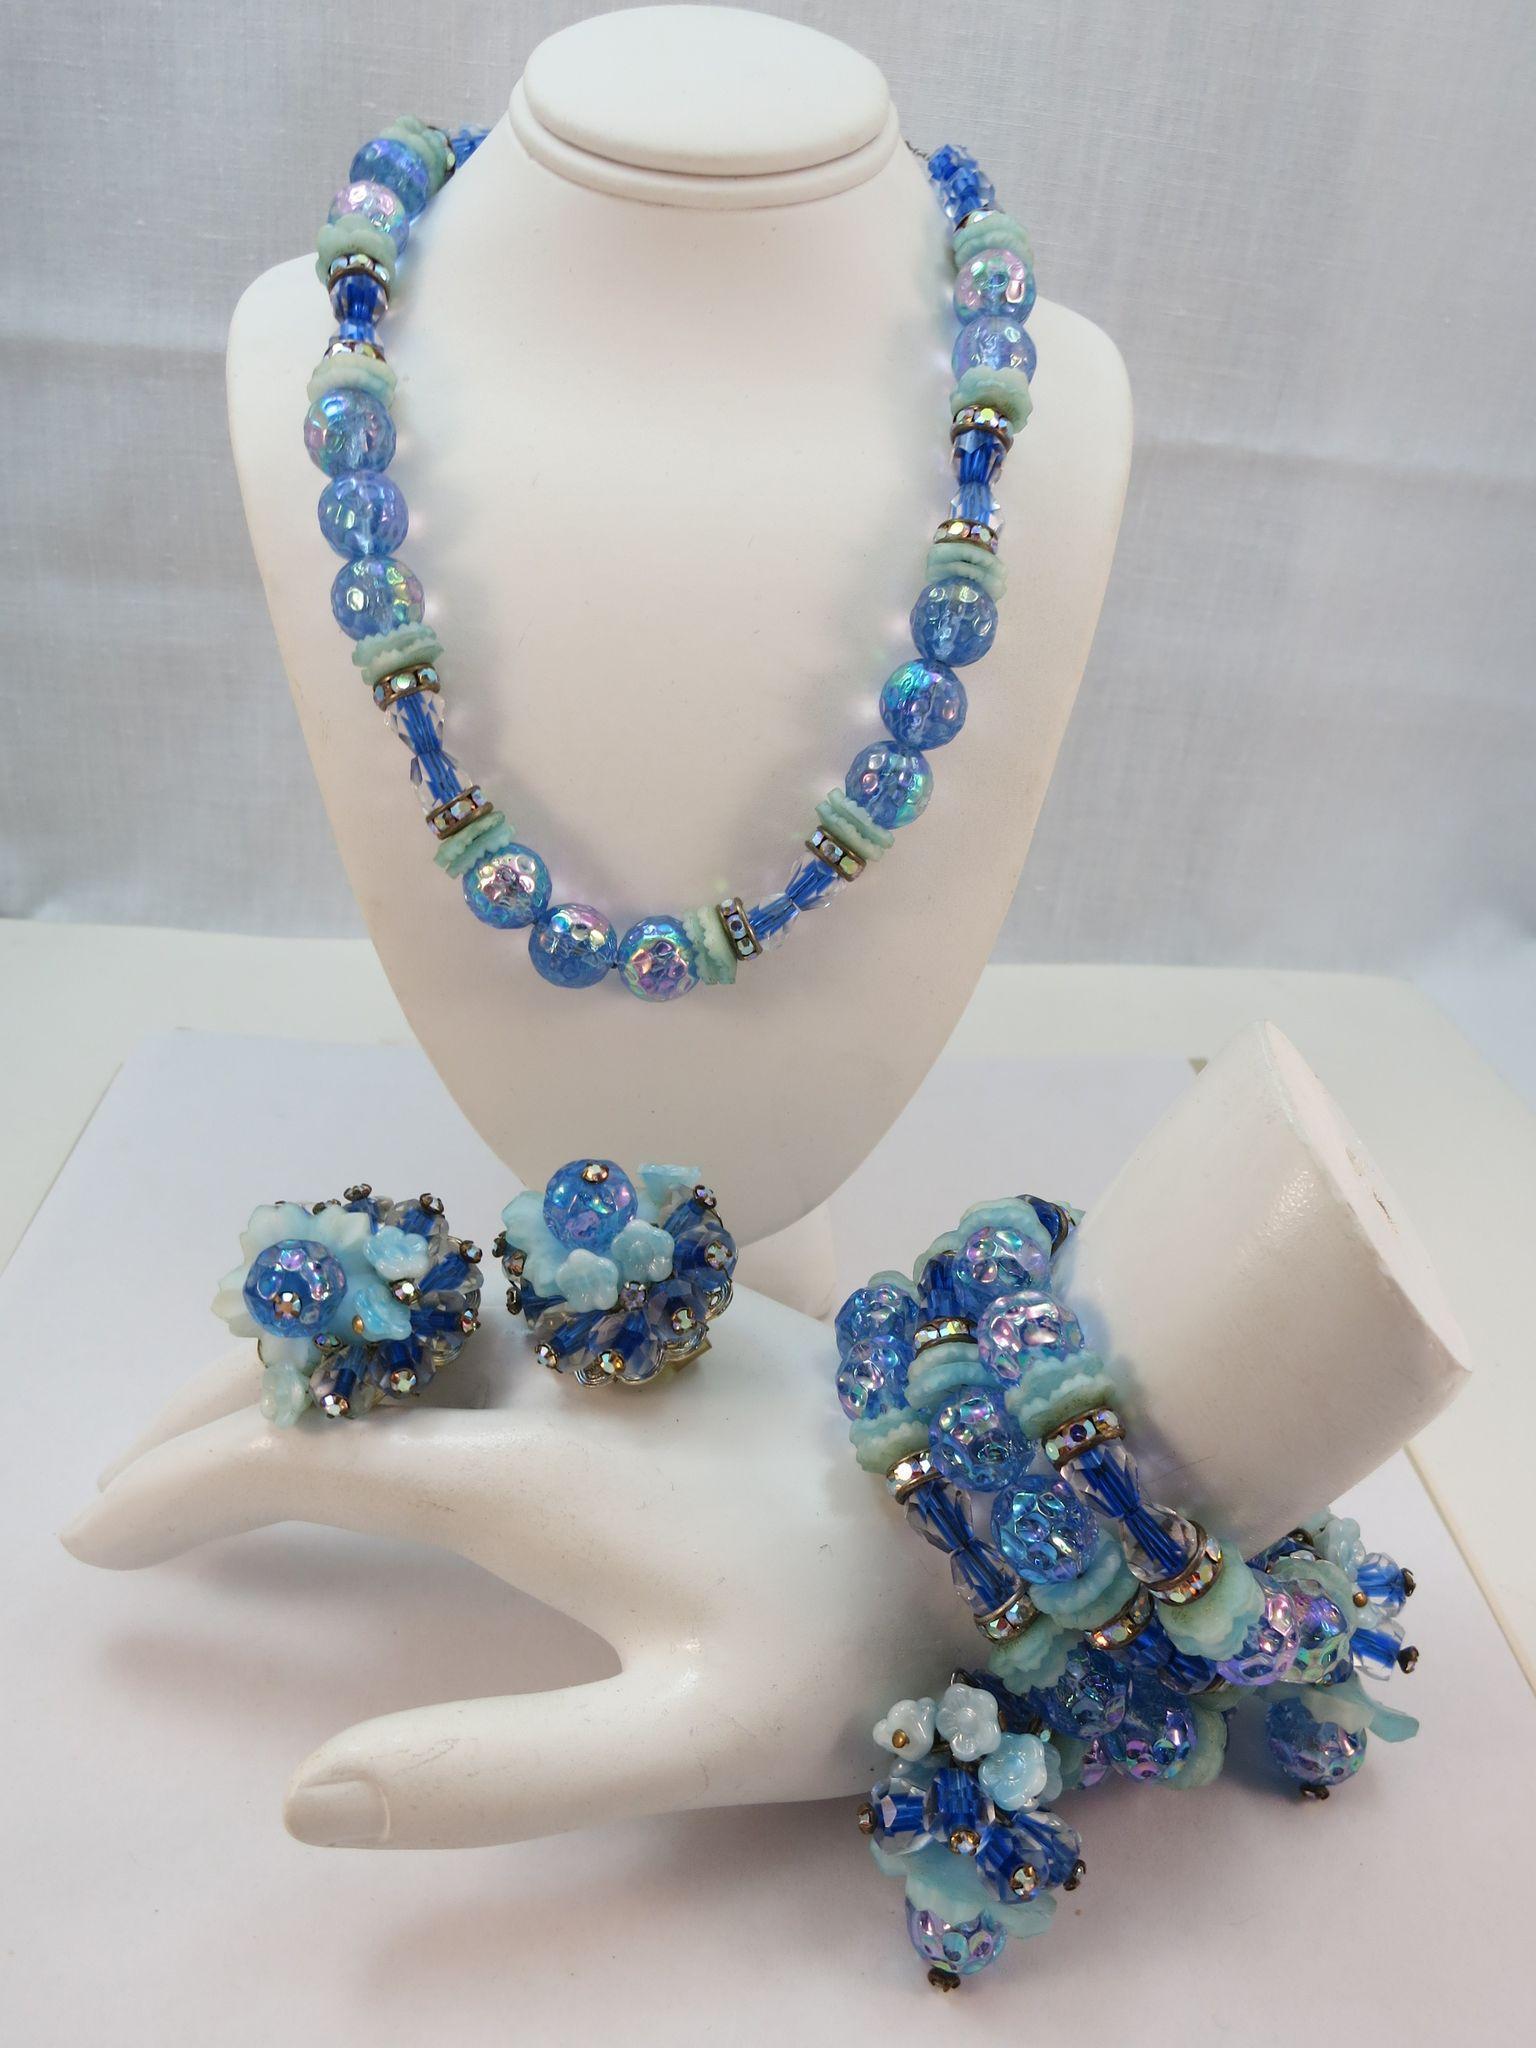 VINTAGE Hobe' Parure Beautiful Blues Flowers and Rhinestones  Necklace, Bracelet and Earrings